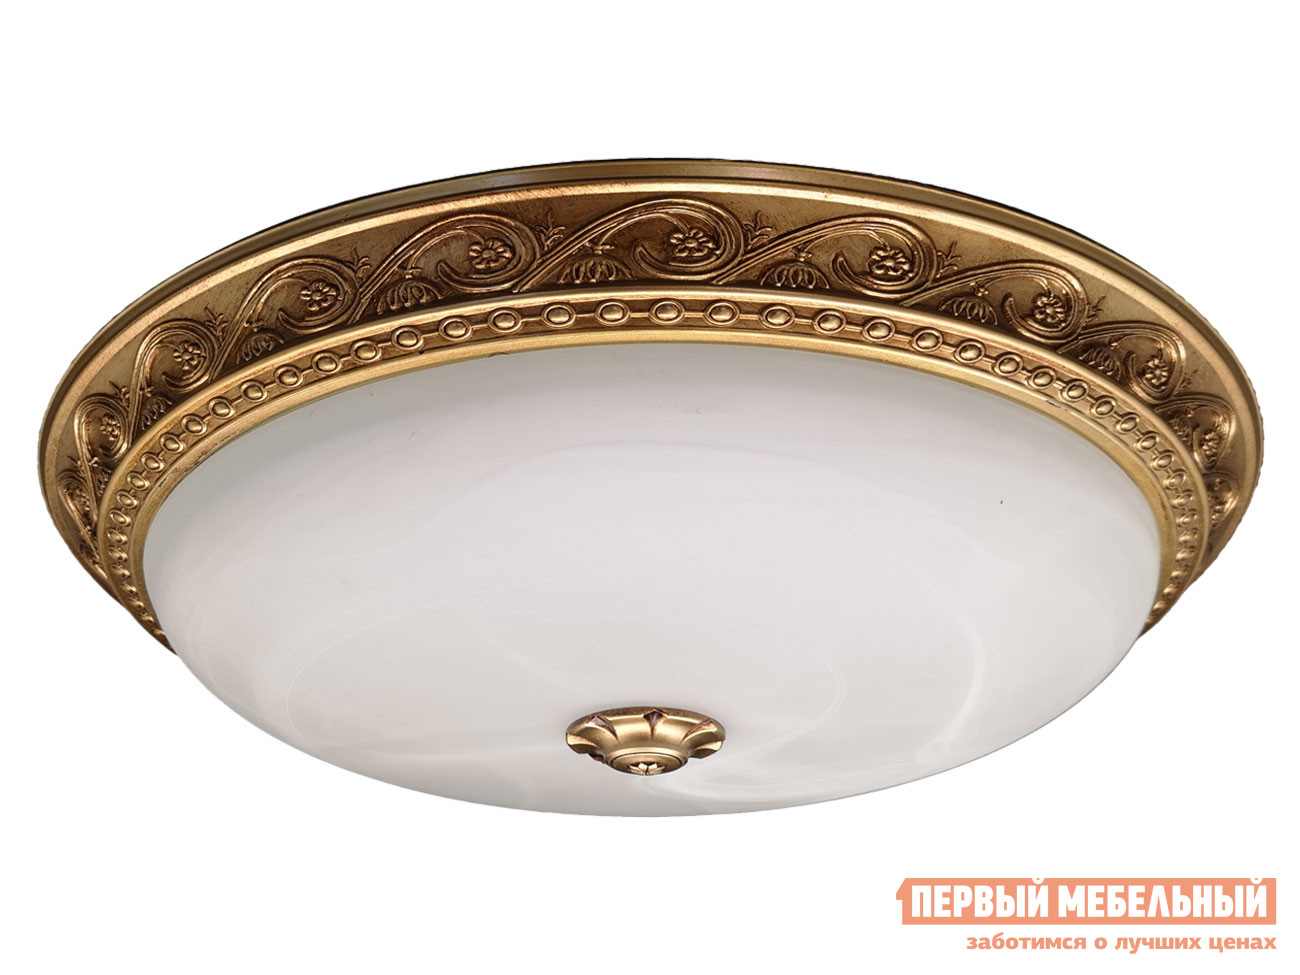 Потолочная люстра  PLC-4005-430 LED 48W Античная бронза / Белый Электросвет 124499